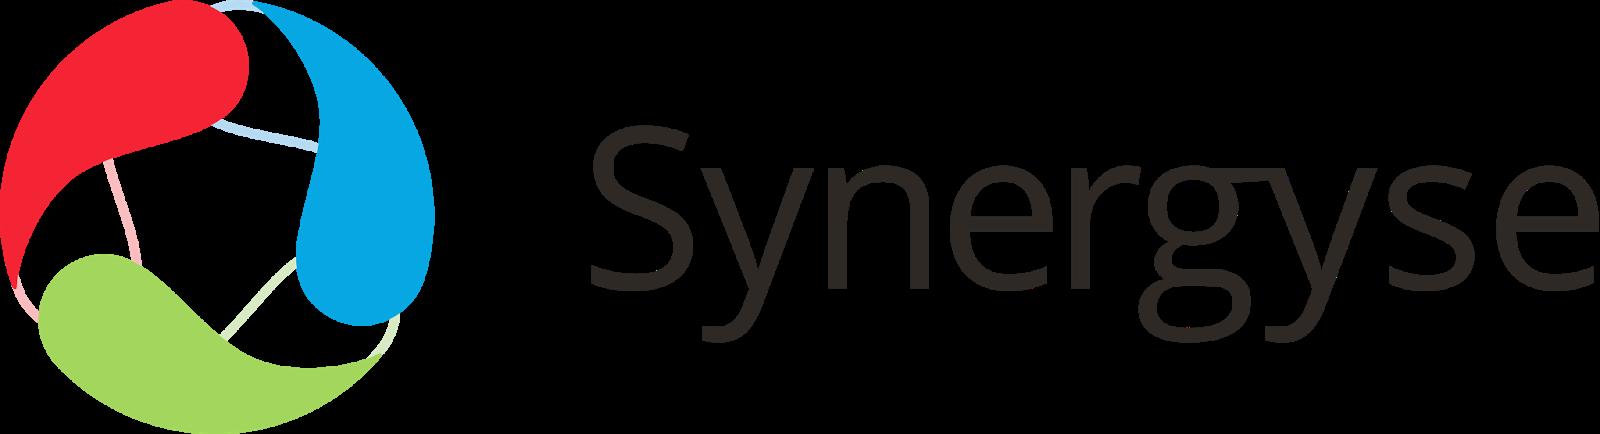 synergyse